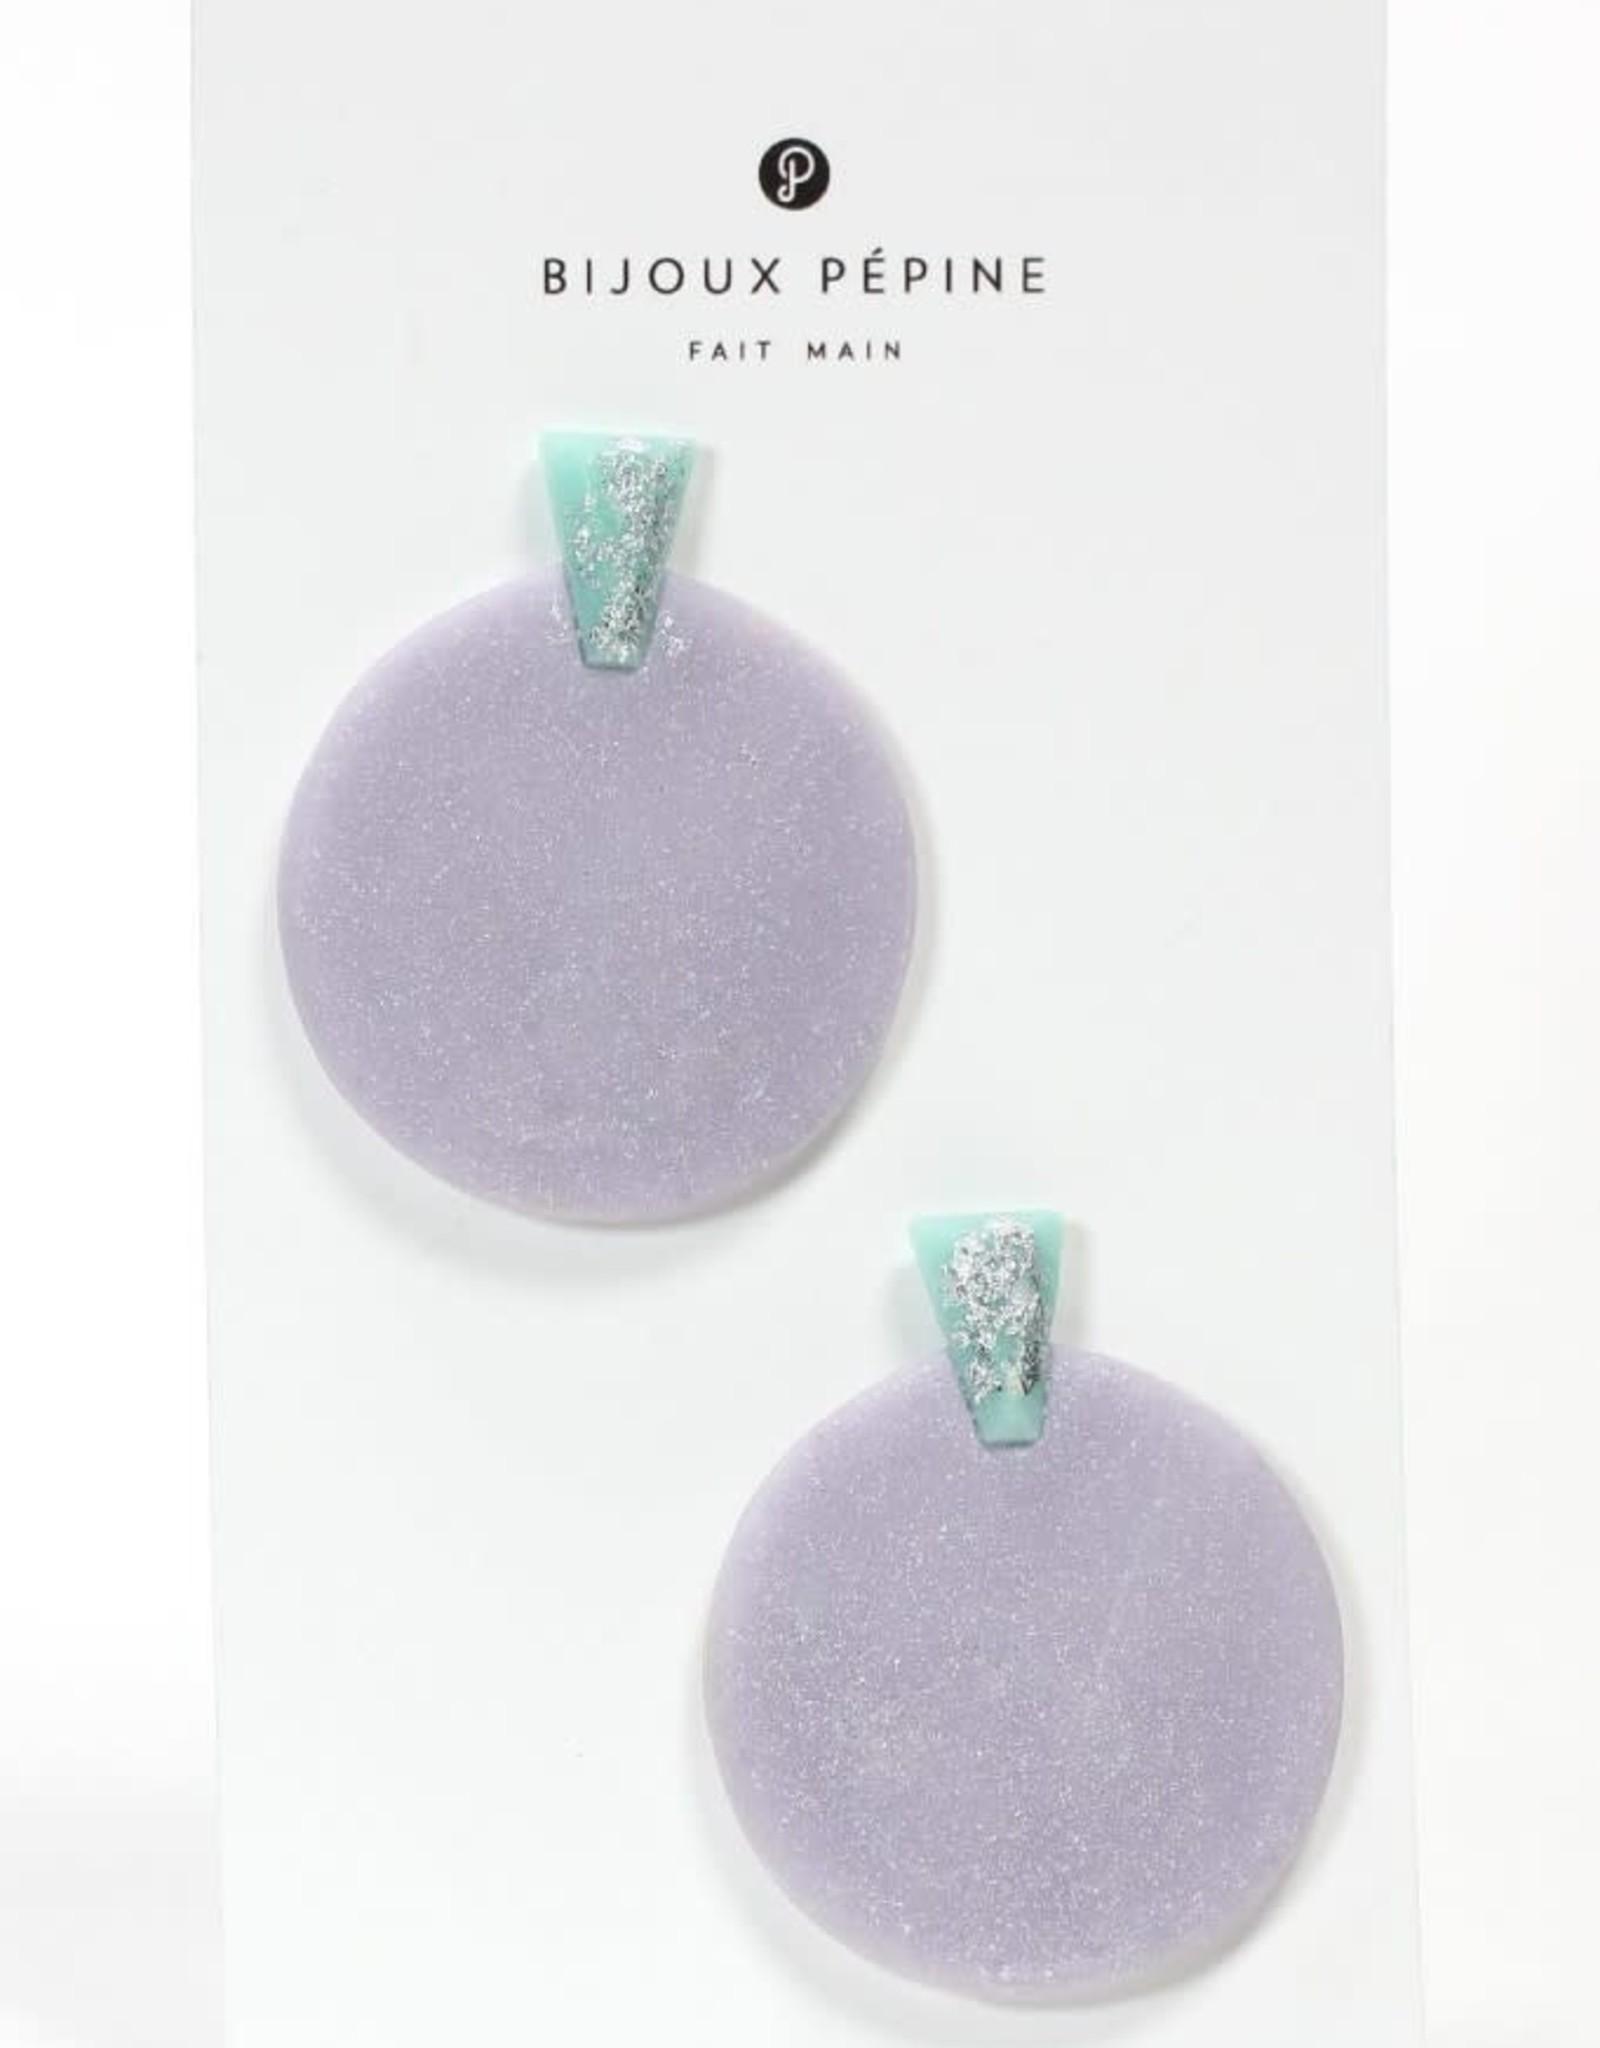 Bijoux Pepine Boucles d'oreilles Ulu Lilas Bijoux Pépine